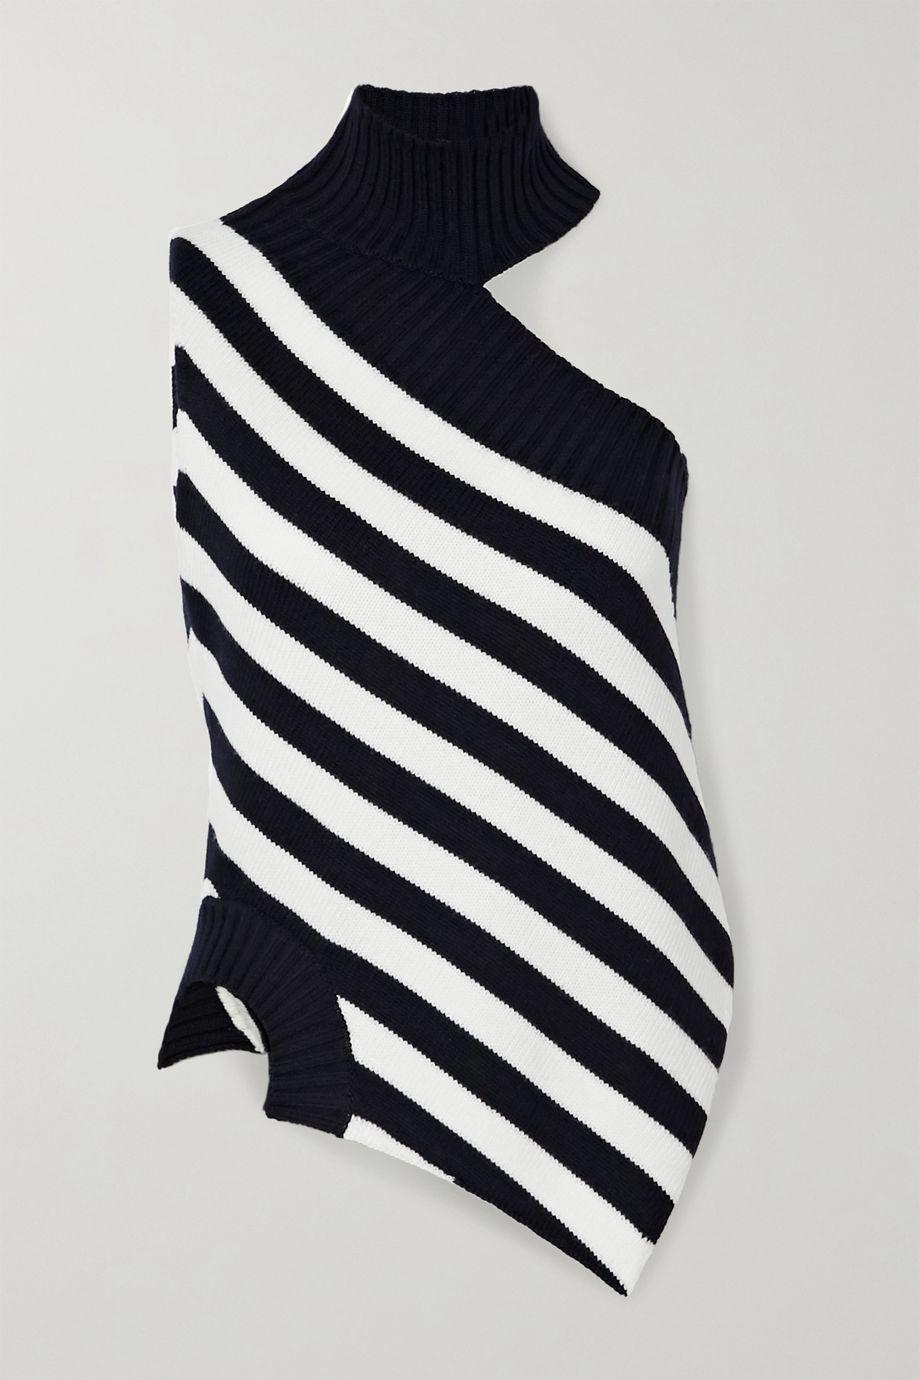 Monse One-shoulder striped merino wool turtleneck sweater